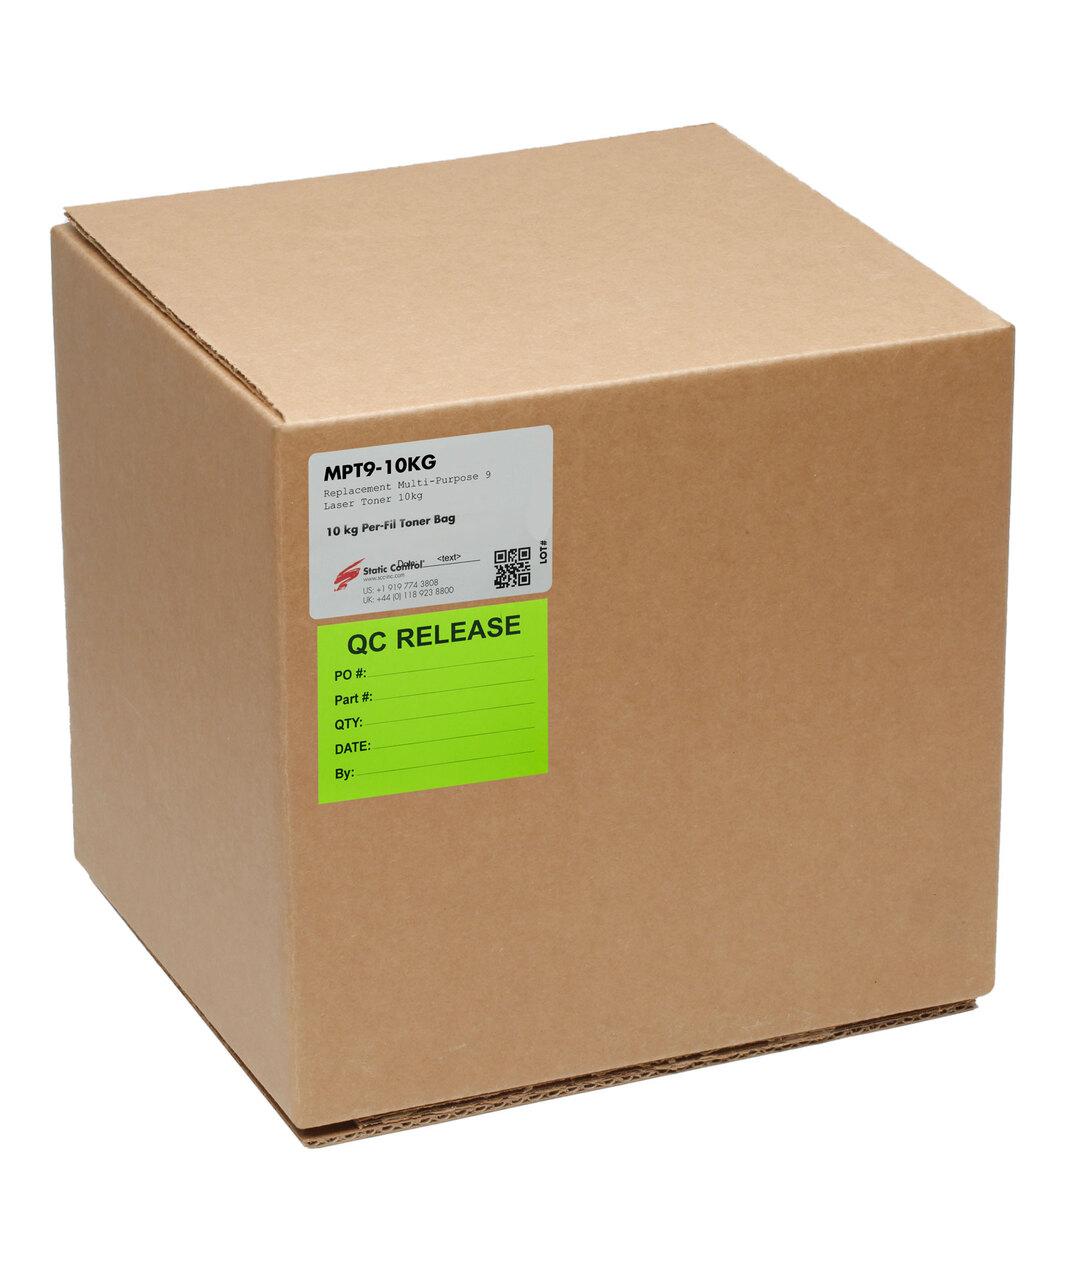 Тонер Static Control Универсальный для HP LJ M425, MPT9,Bk, 10 кг, коробка MPT9-10KG